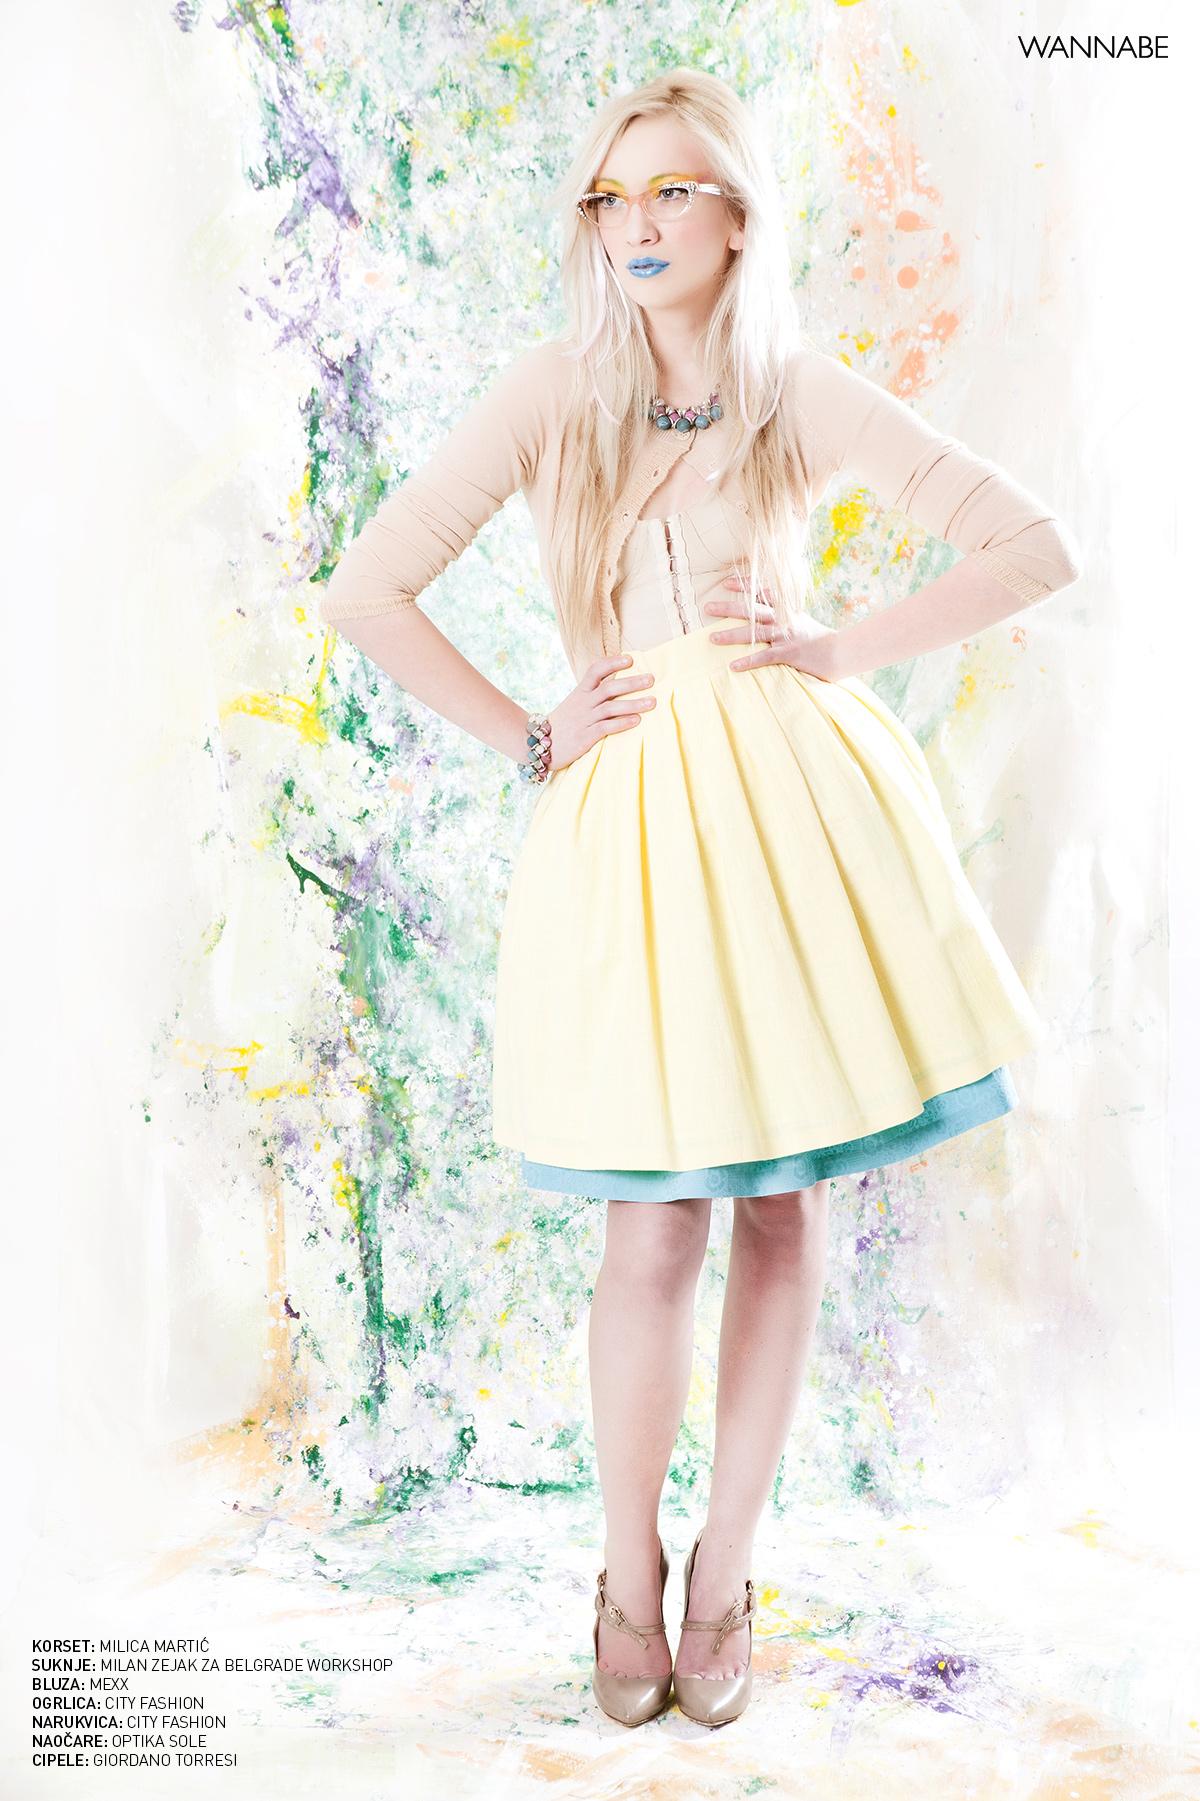 Wannabe Editorijal April 4 Wannabe editorijal: The Princess of Spring